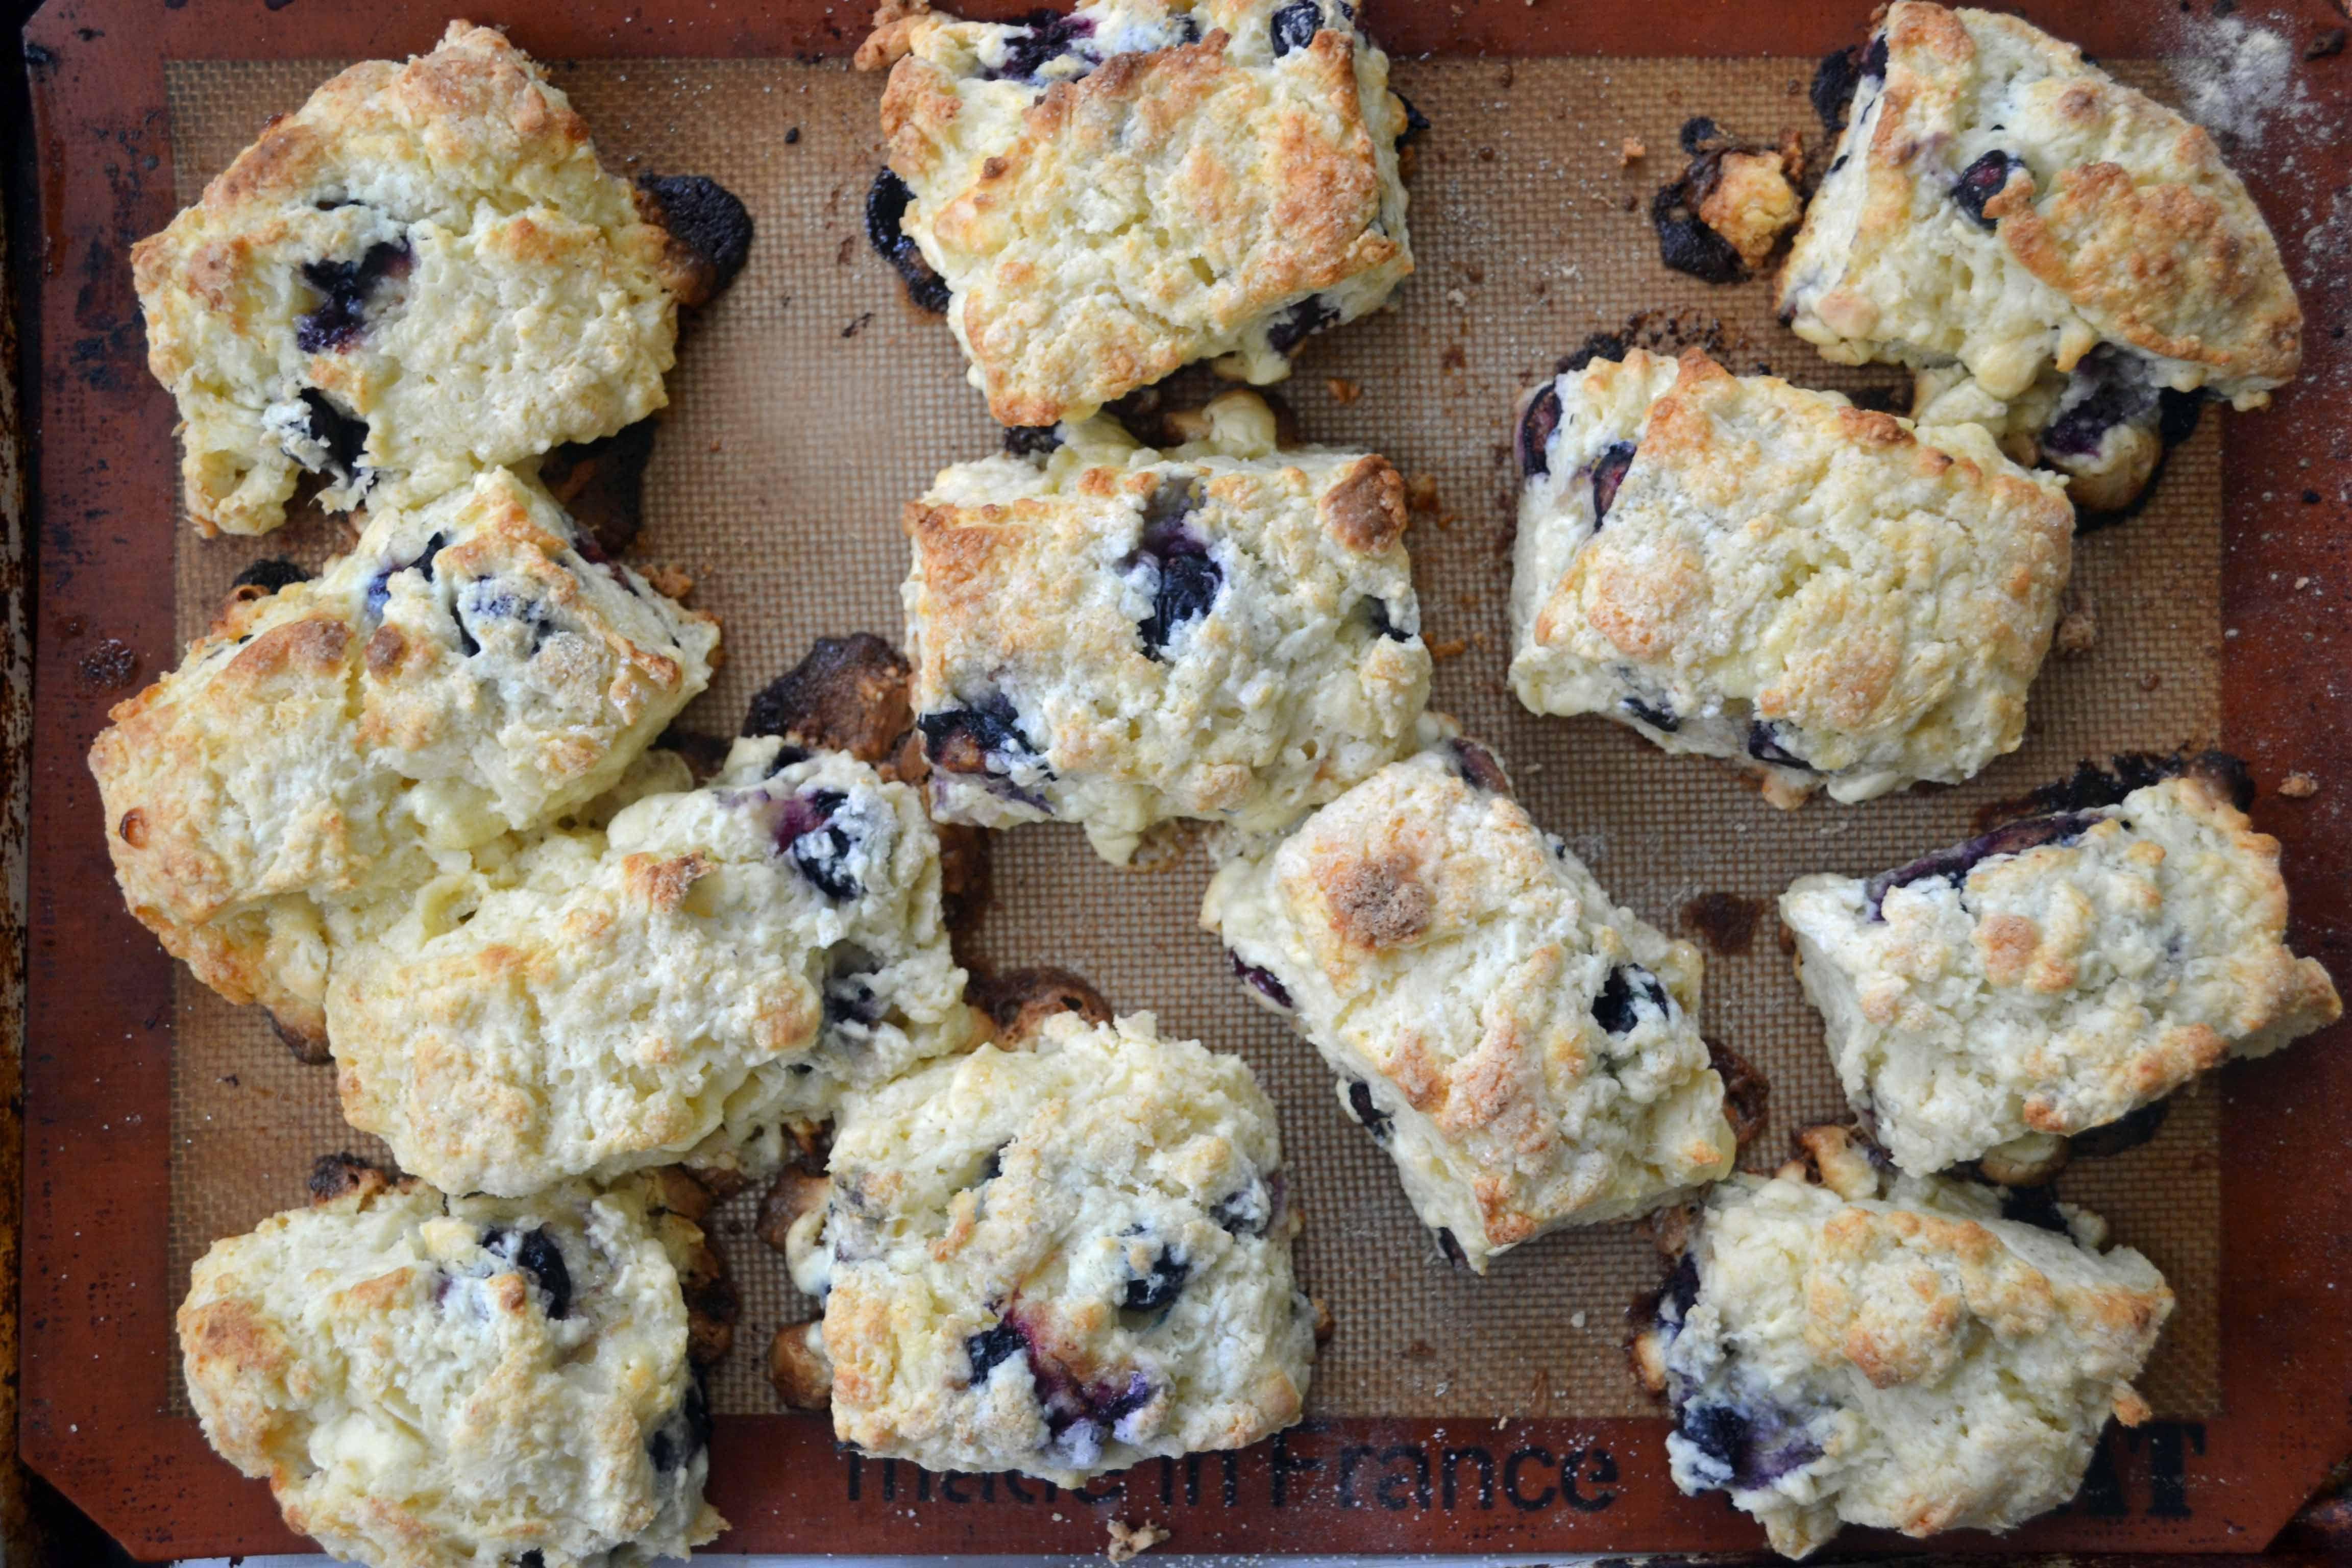 blueberry white chocolate scones 1 Blueberry & White Chocolate Chunk Scones